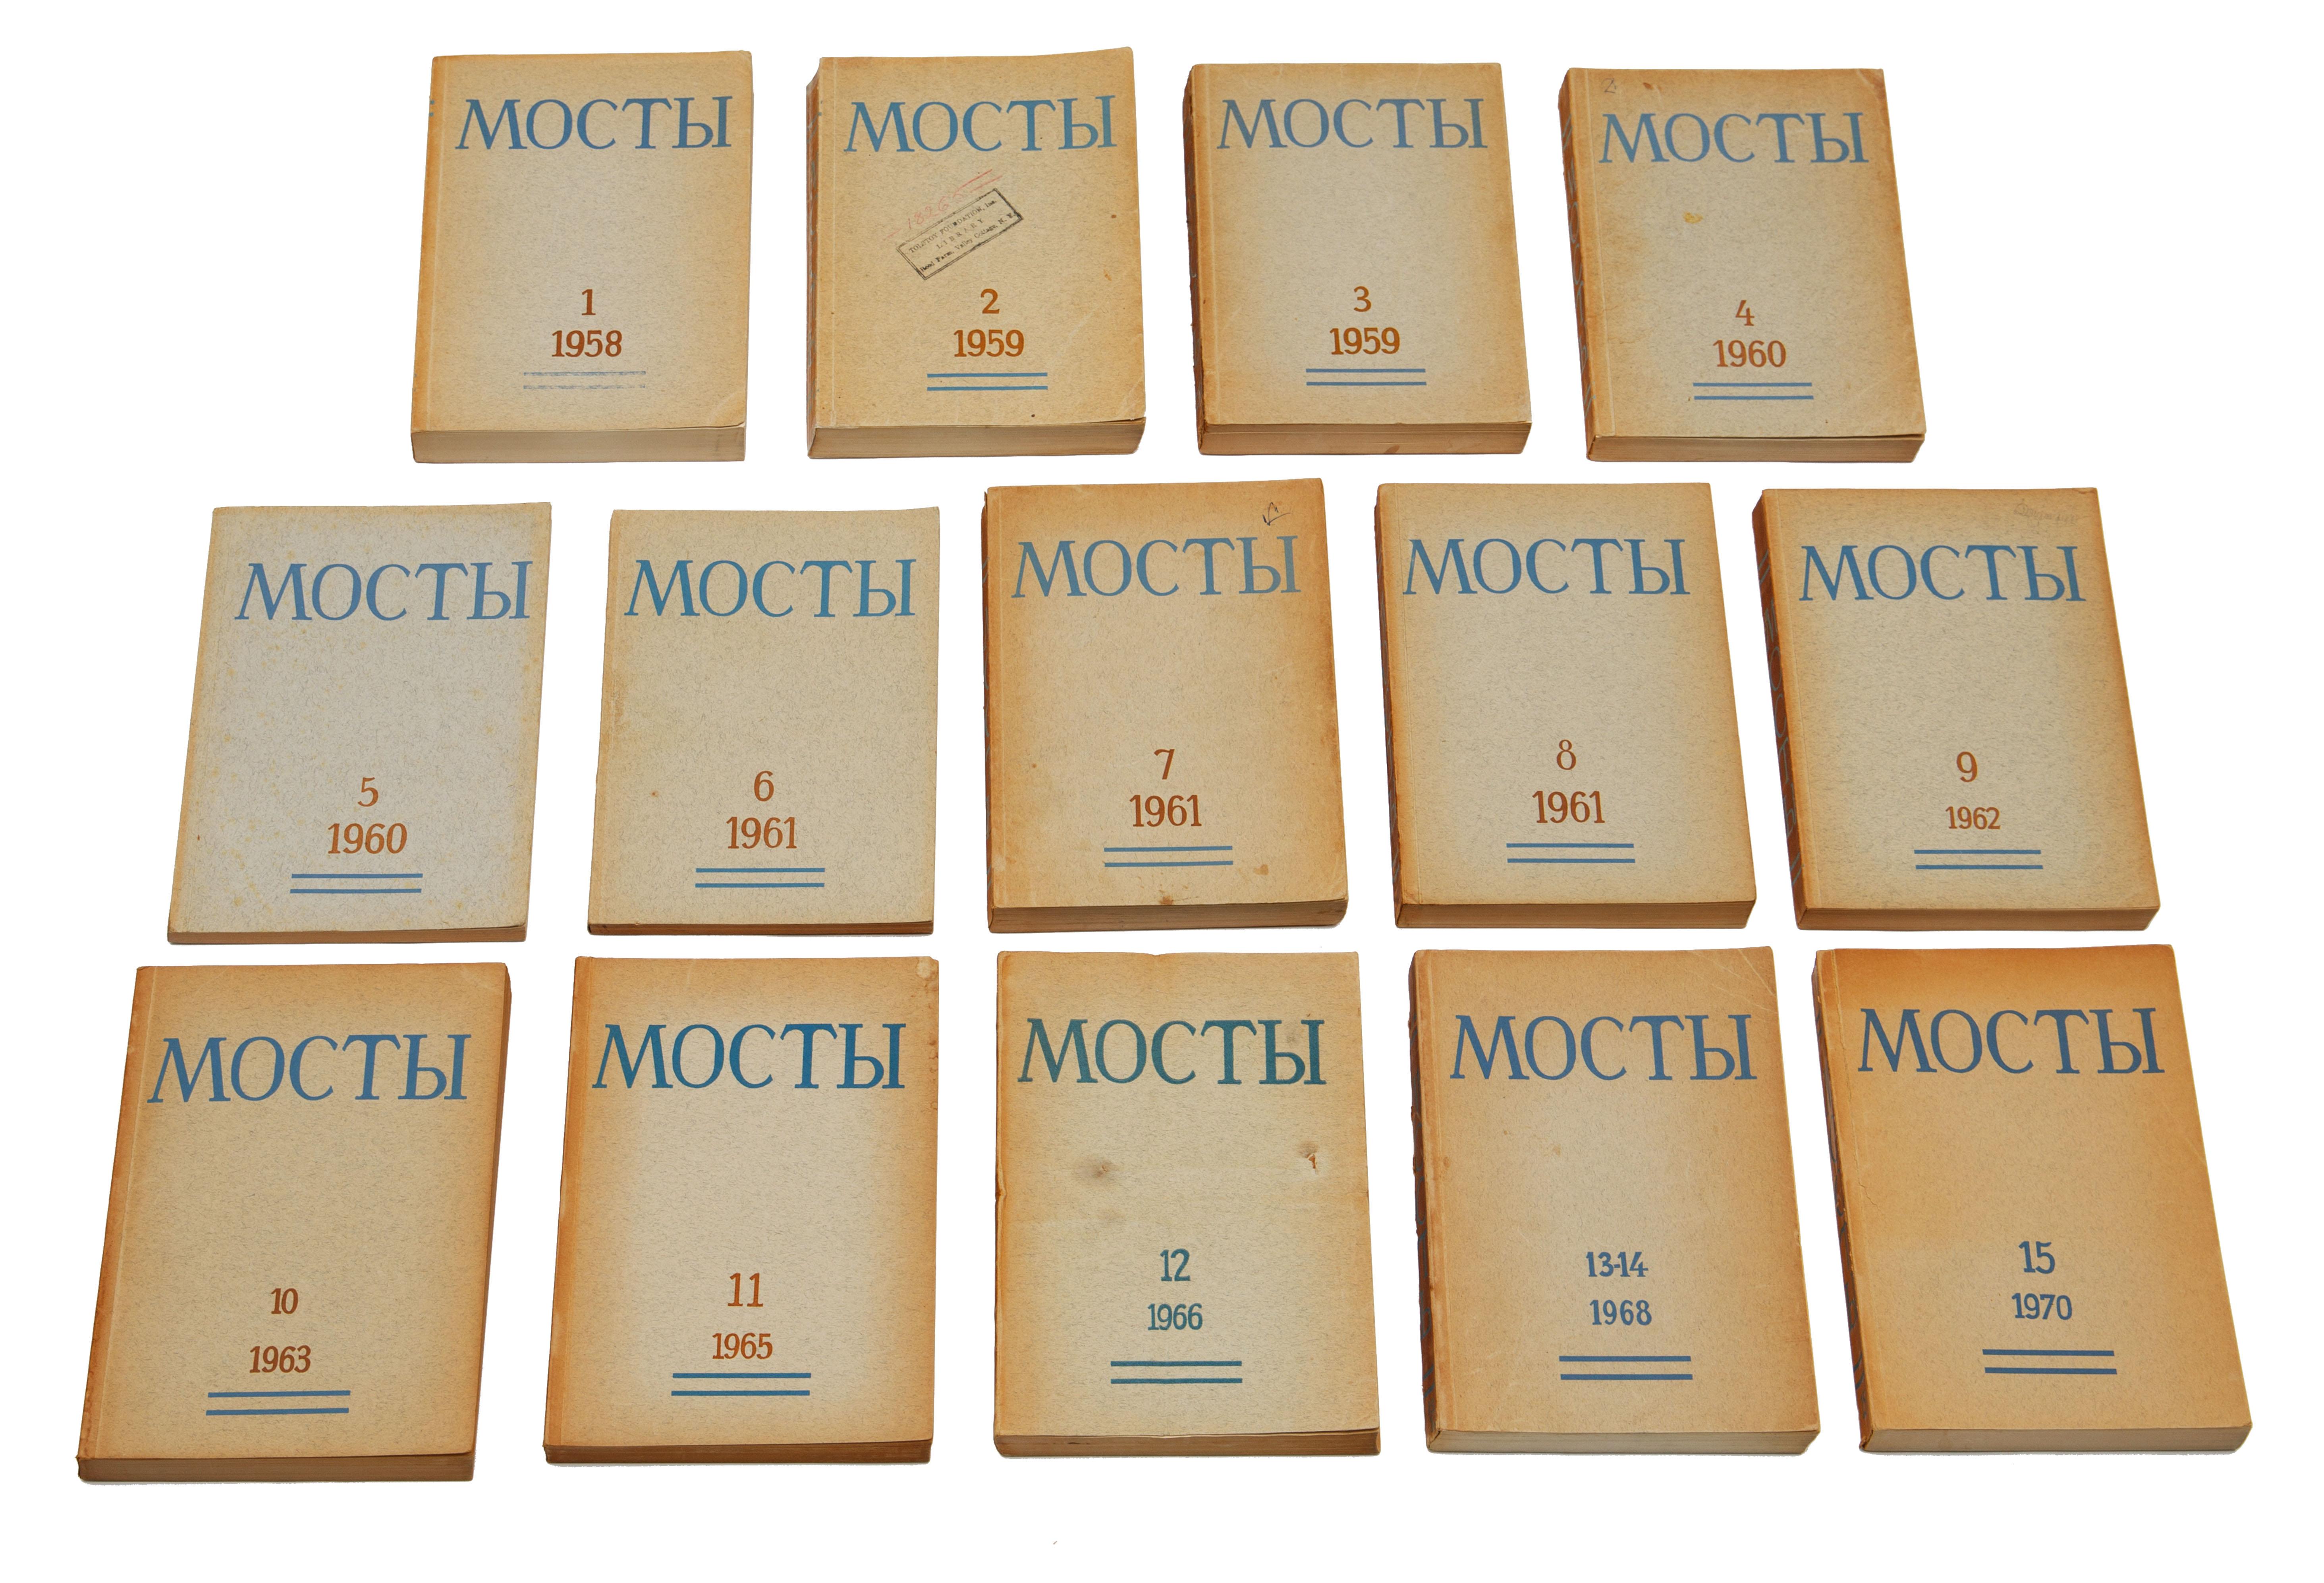 A COMPLETE SET OF MOSTY [BRIDGES] ALMANAC, 1958-1970